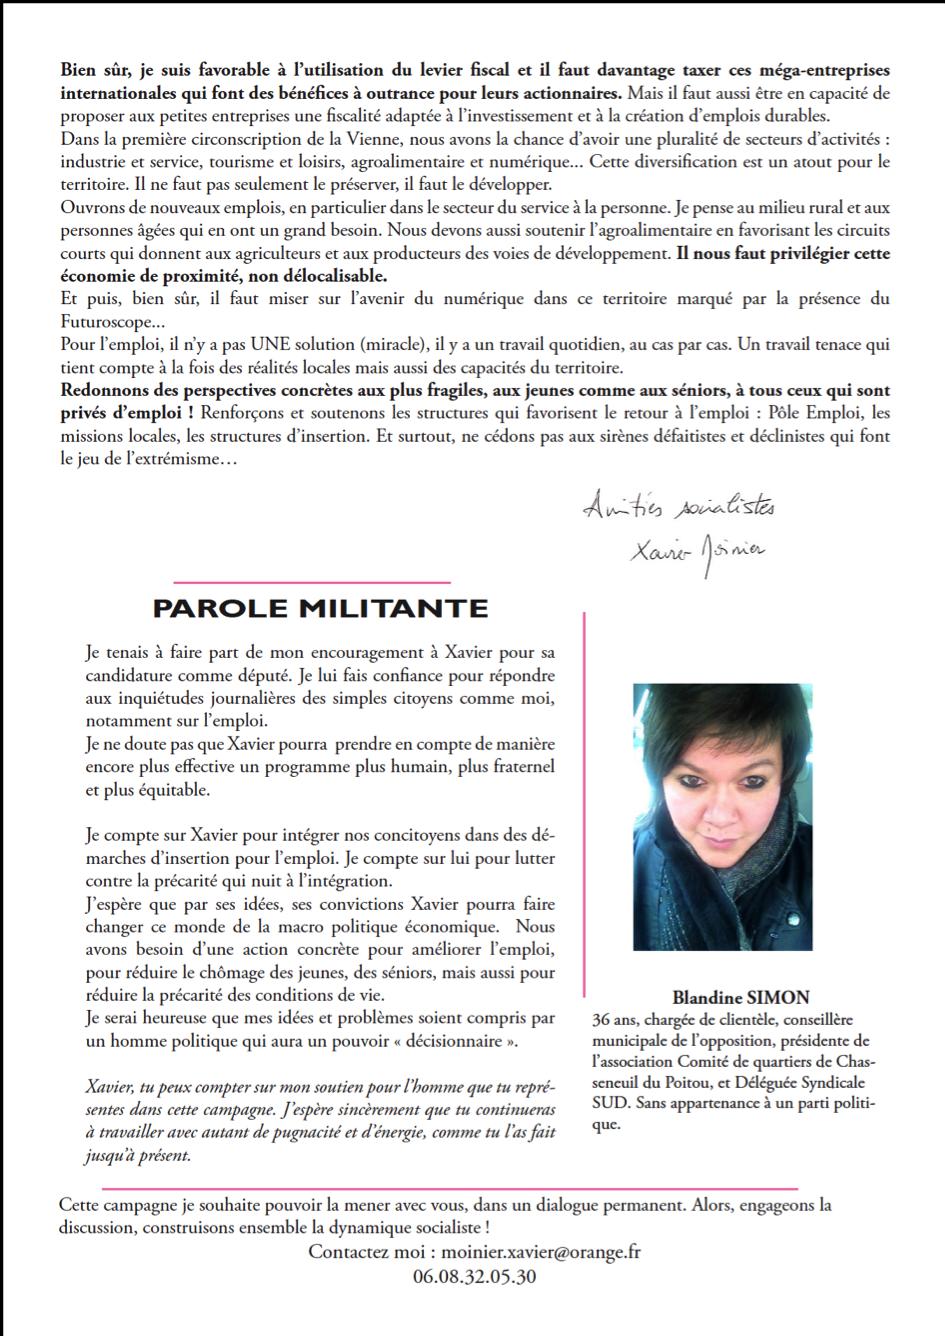 xaviermoinier-lettre-aux-militants3-verso